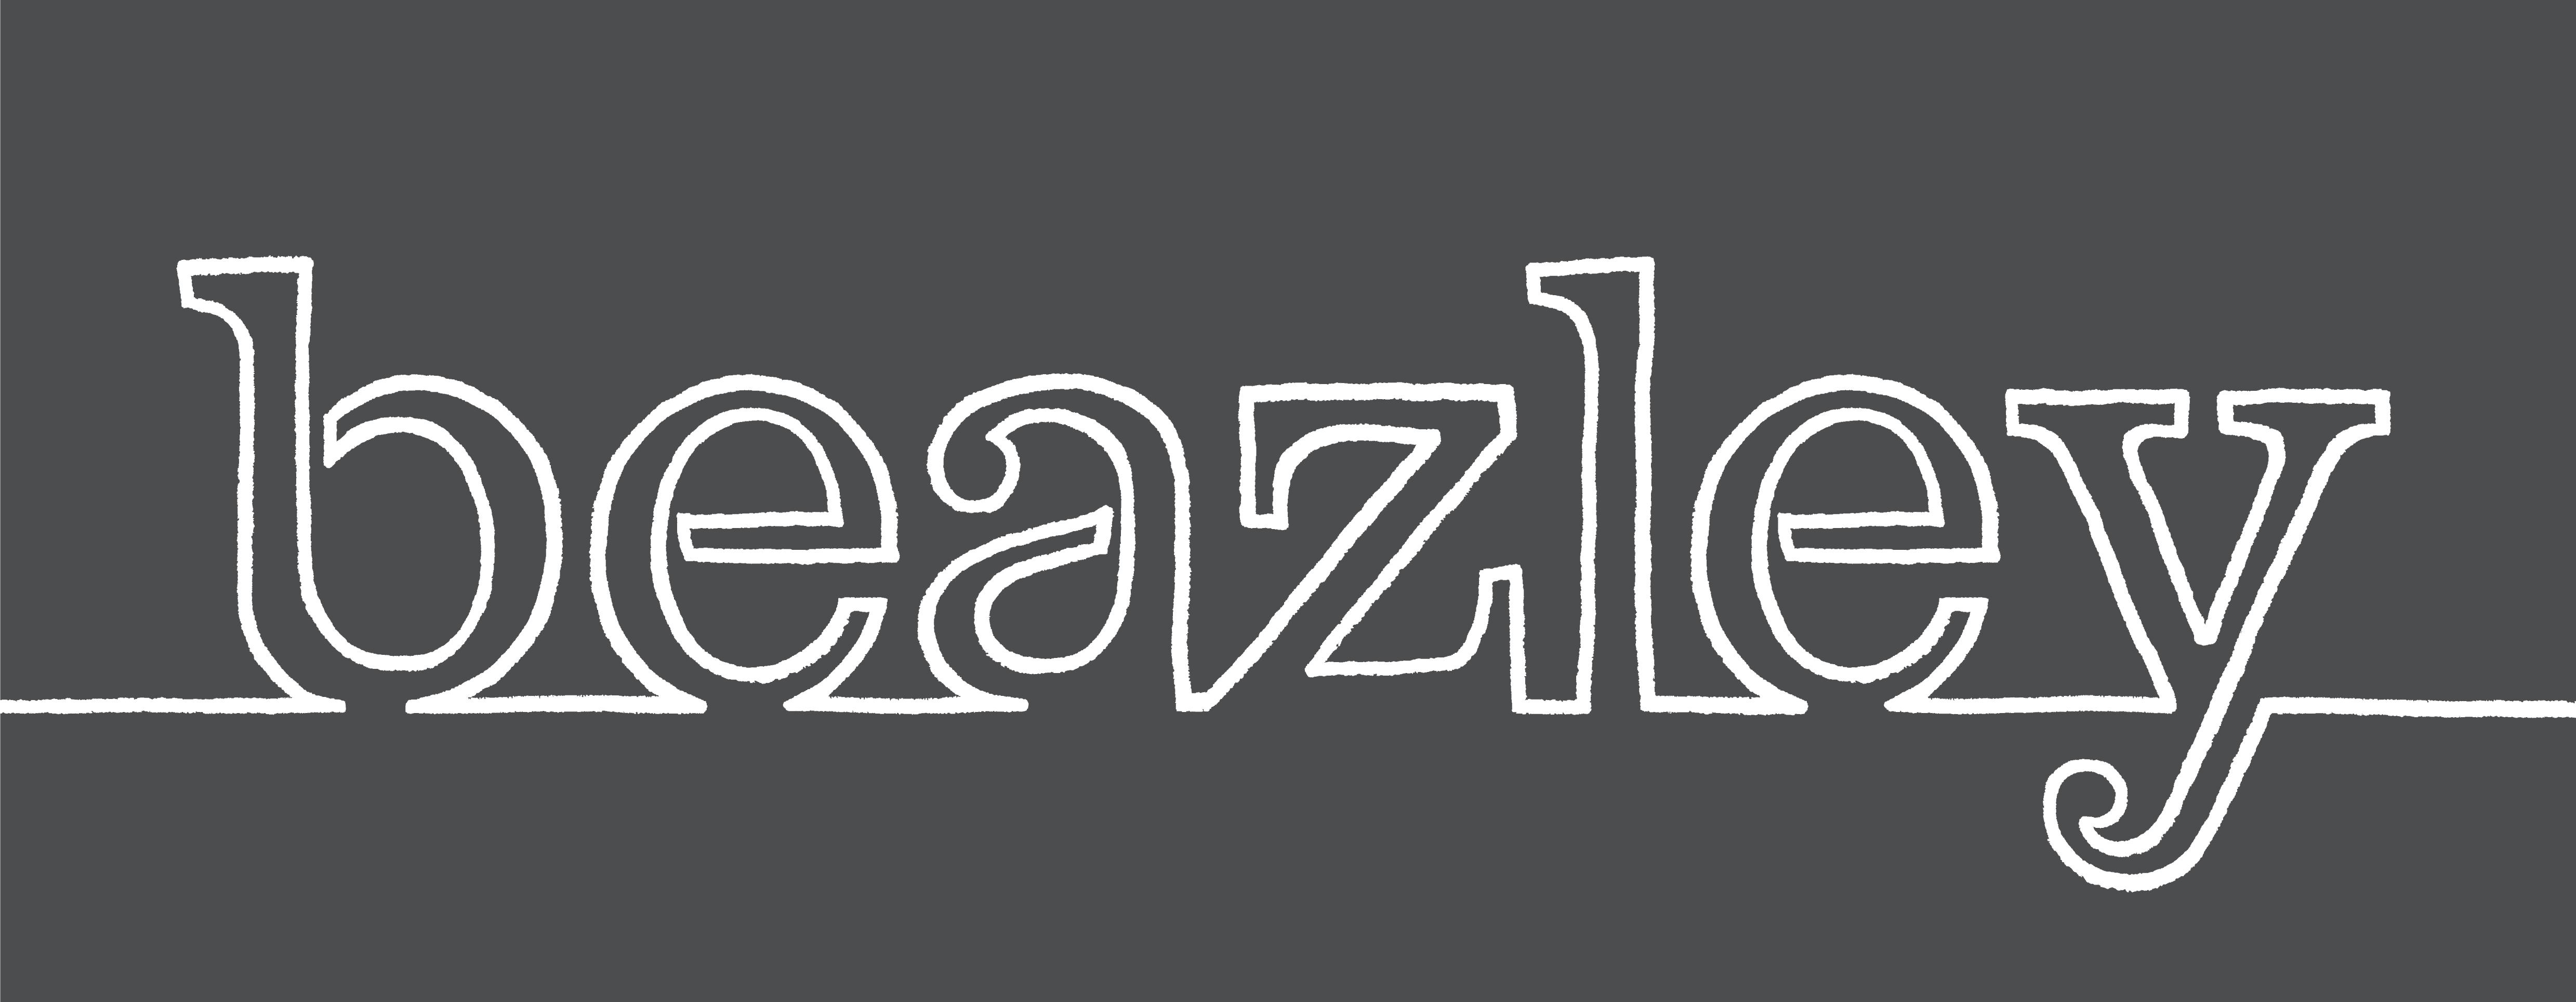 Beazley Third Party Logo17